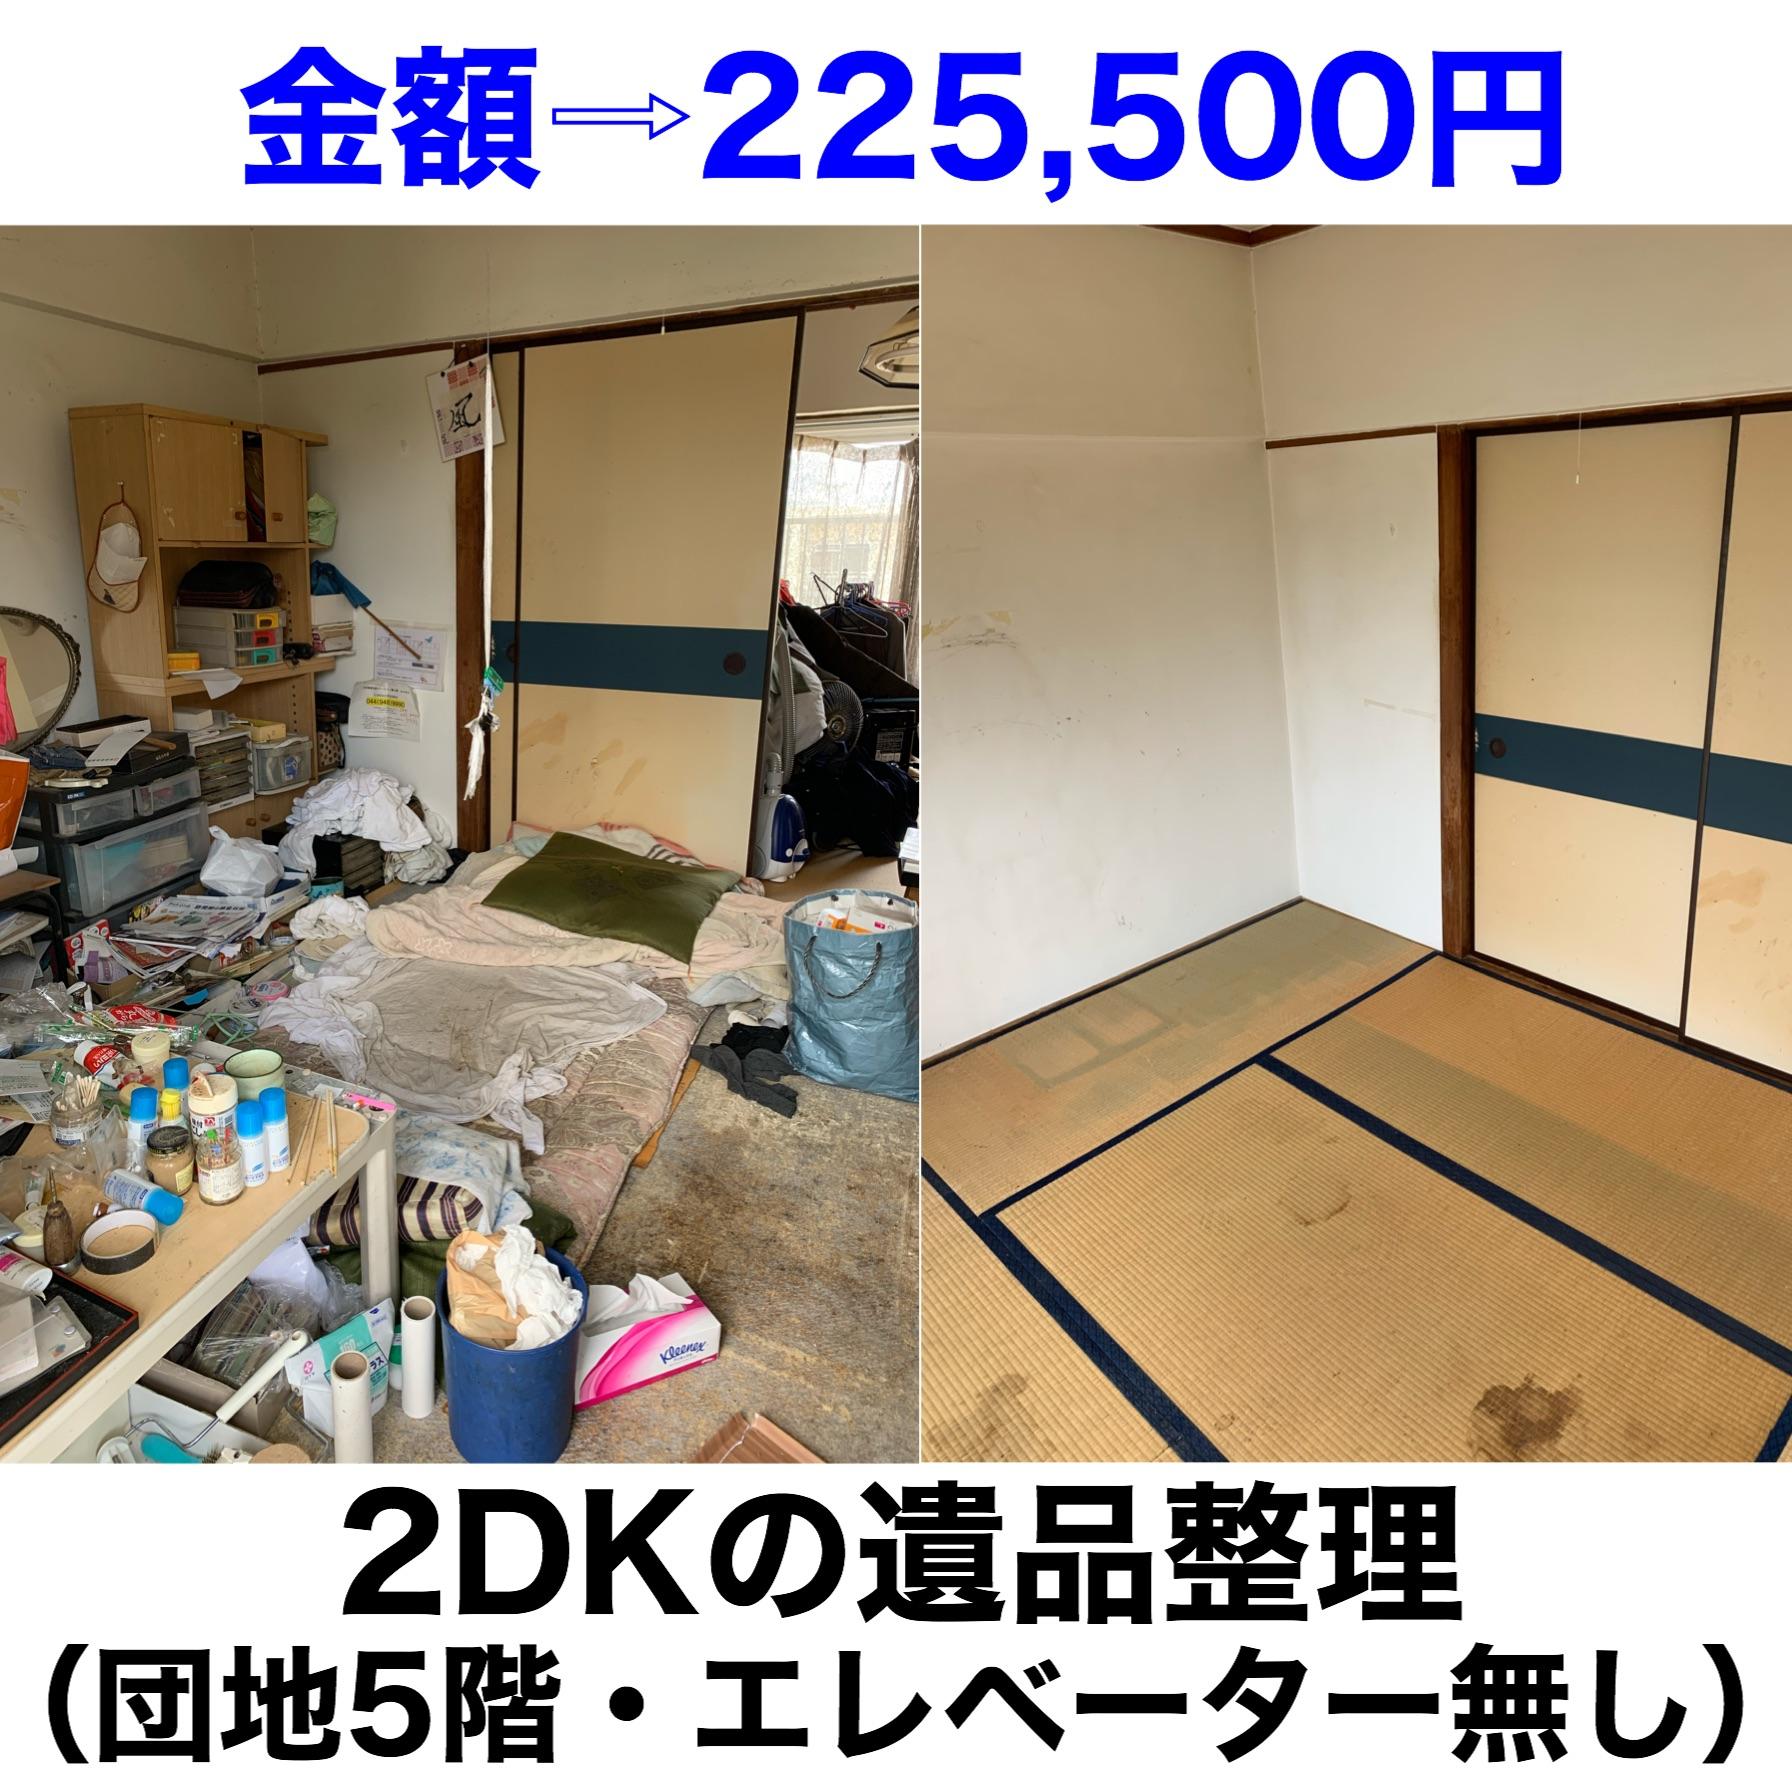 S__515014658